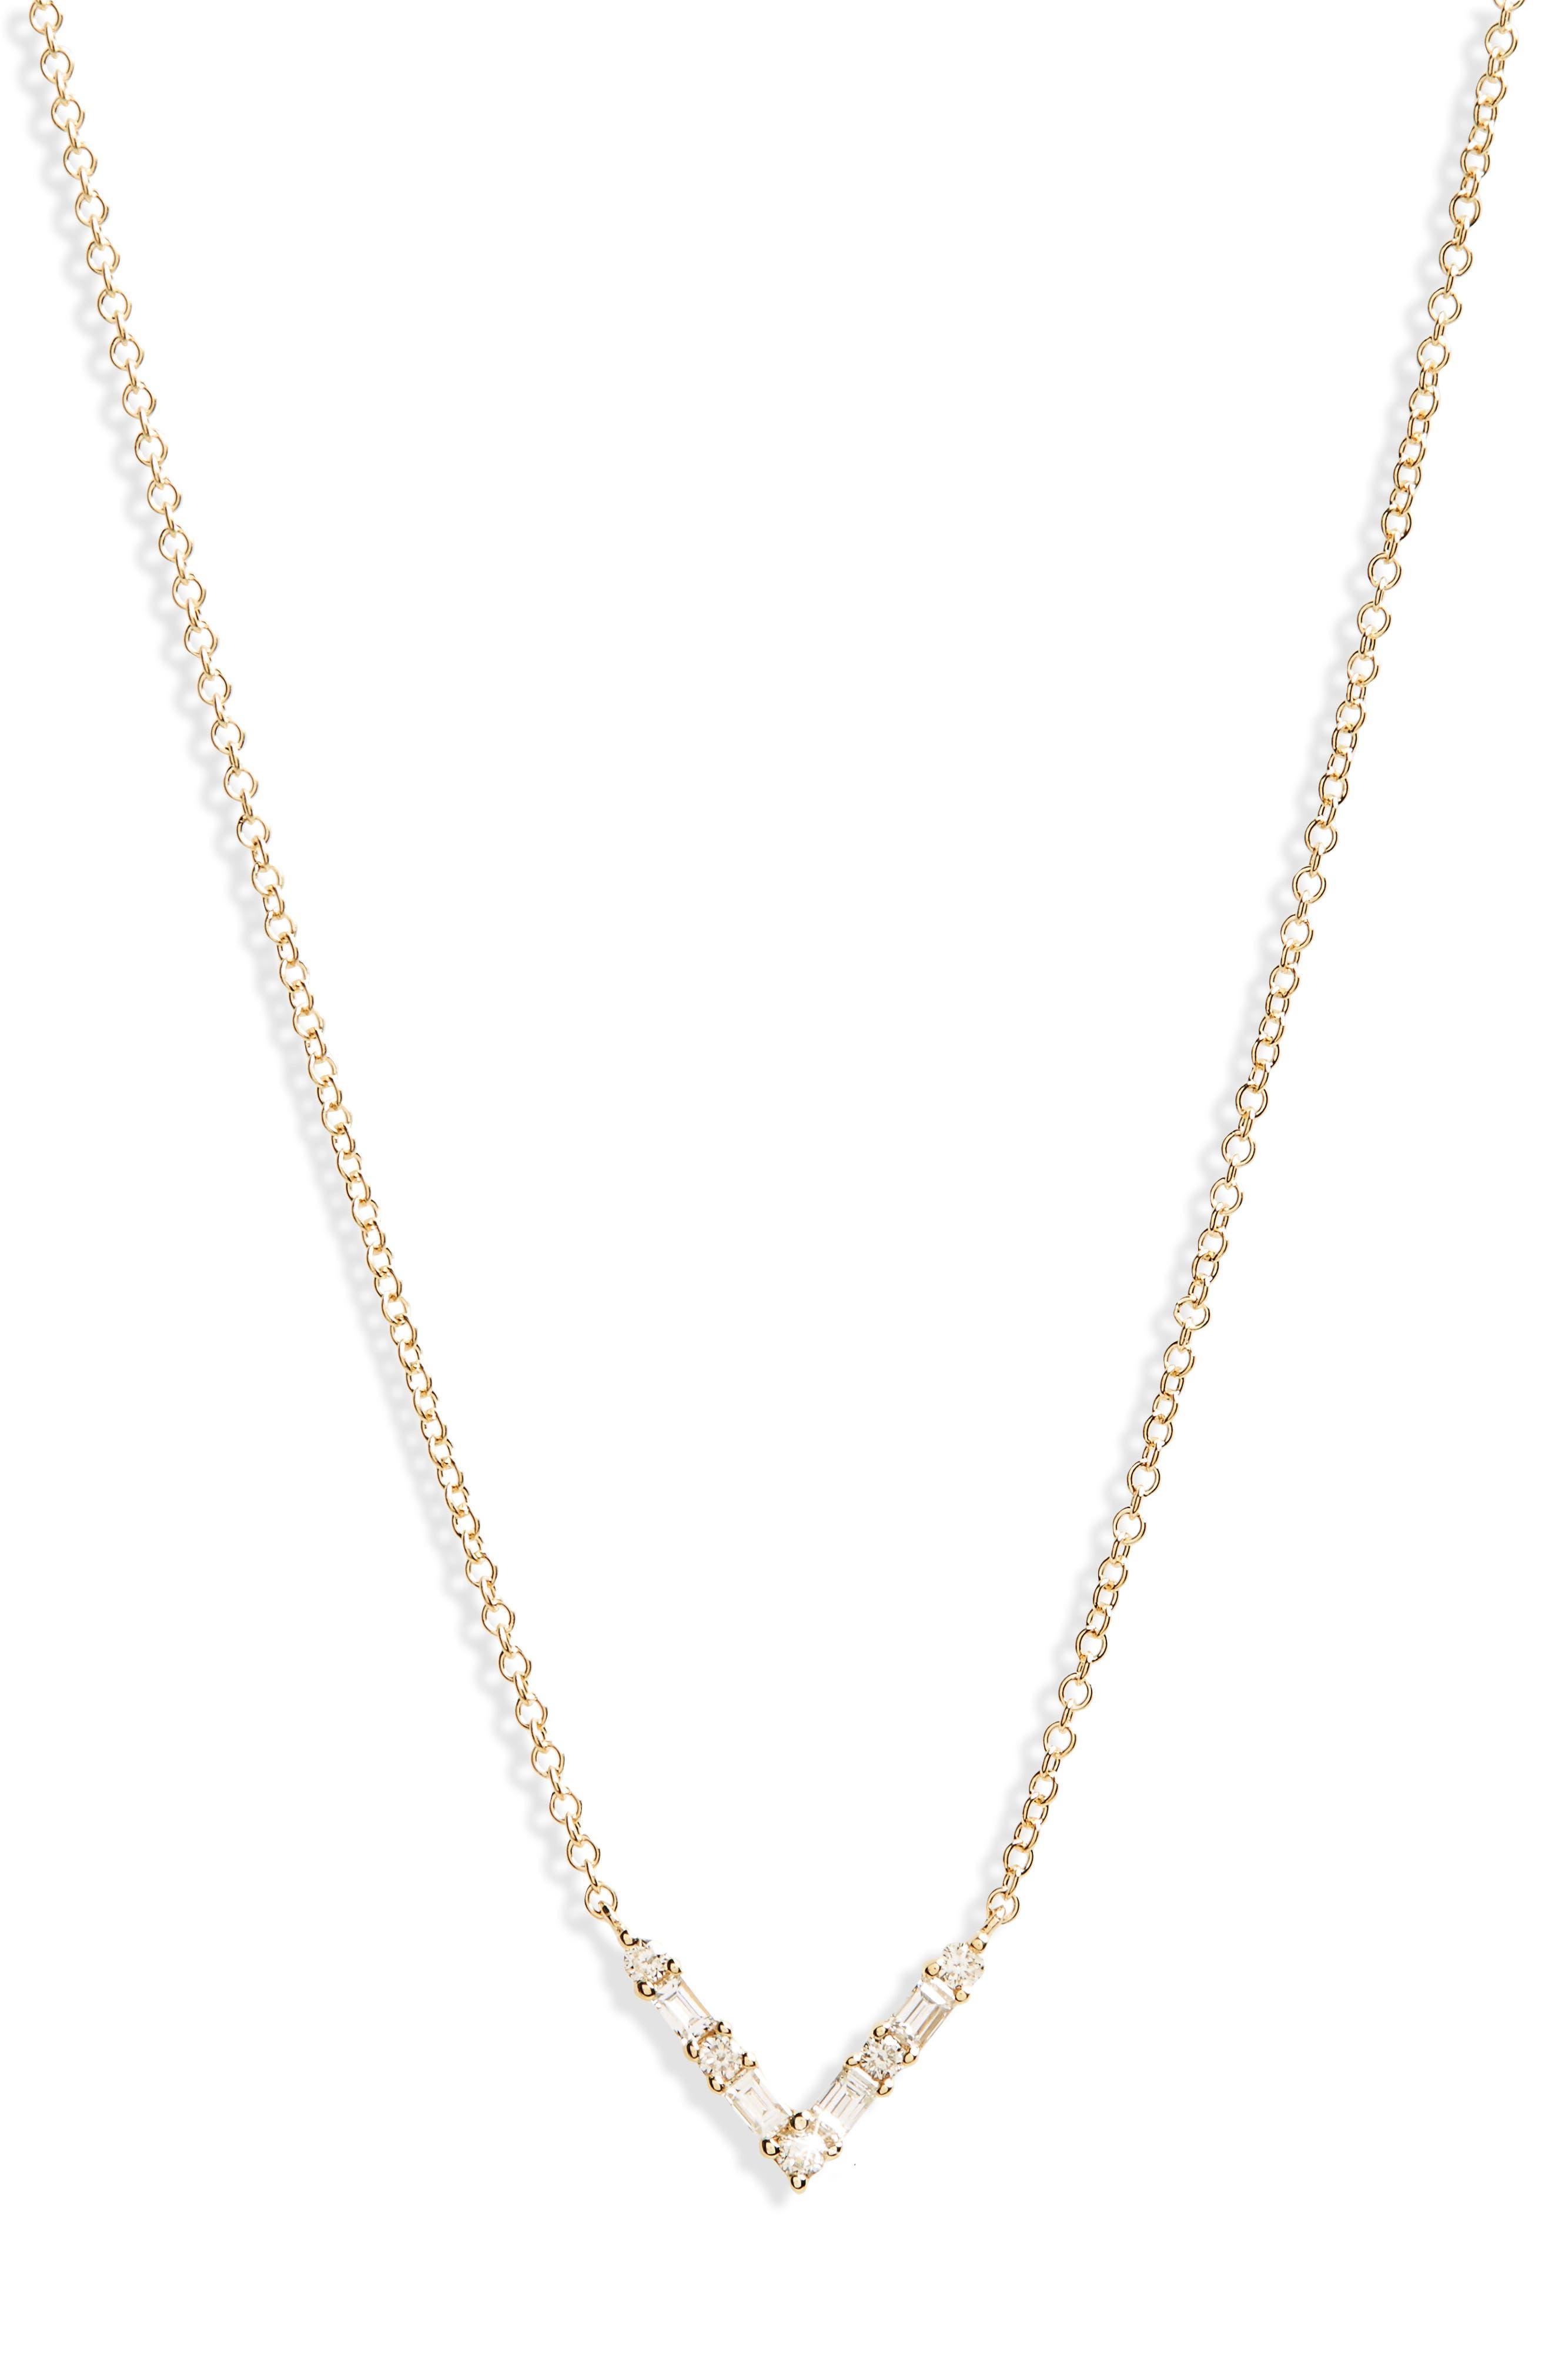 Main Image - EF COLLECTION Diamond Baguette Pendant Necklace